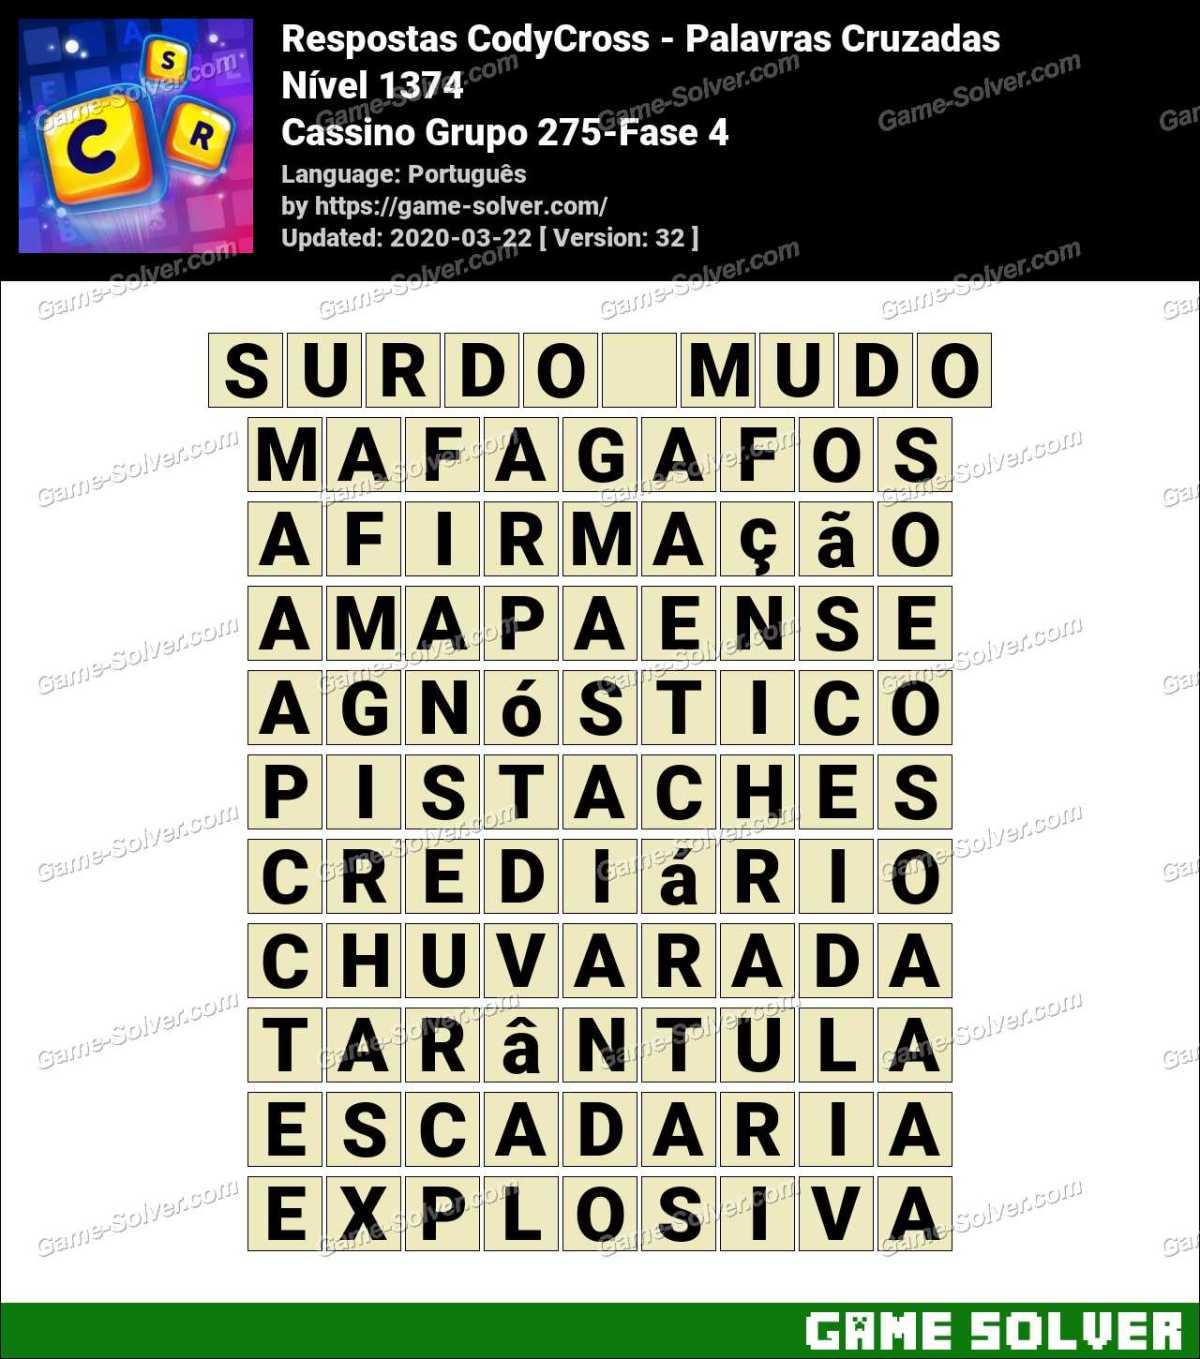 Respostas CodyCross Cassino Grupo 275-Fase 4